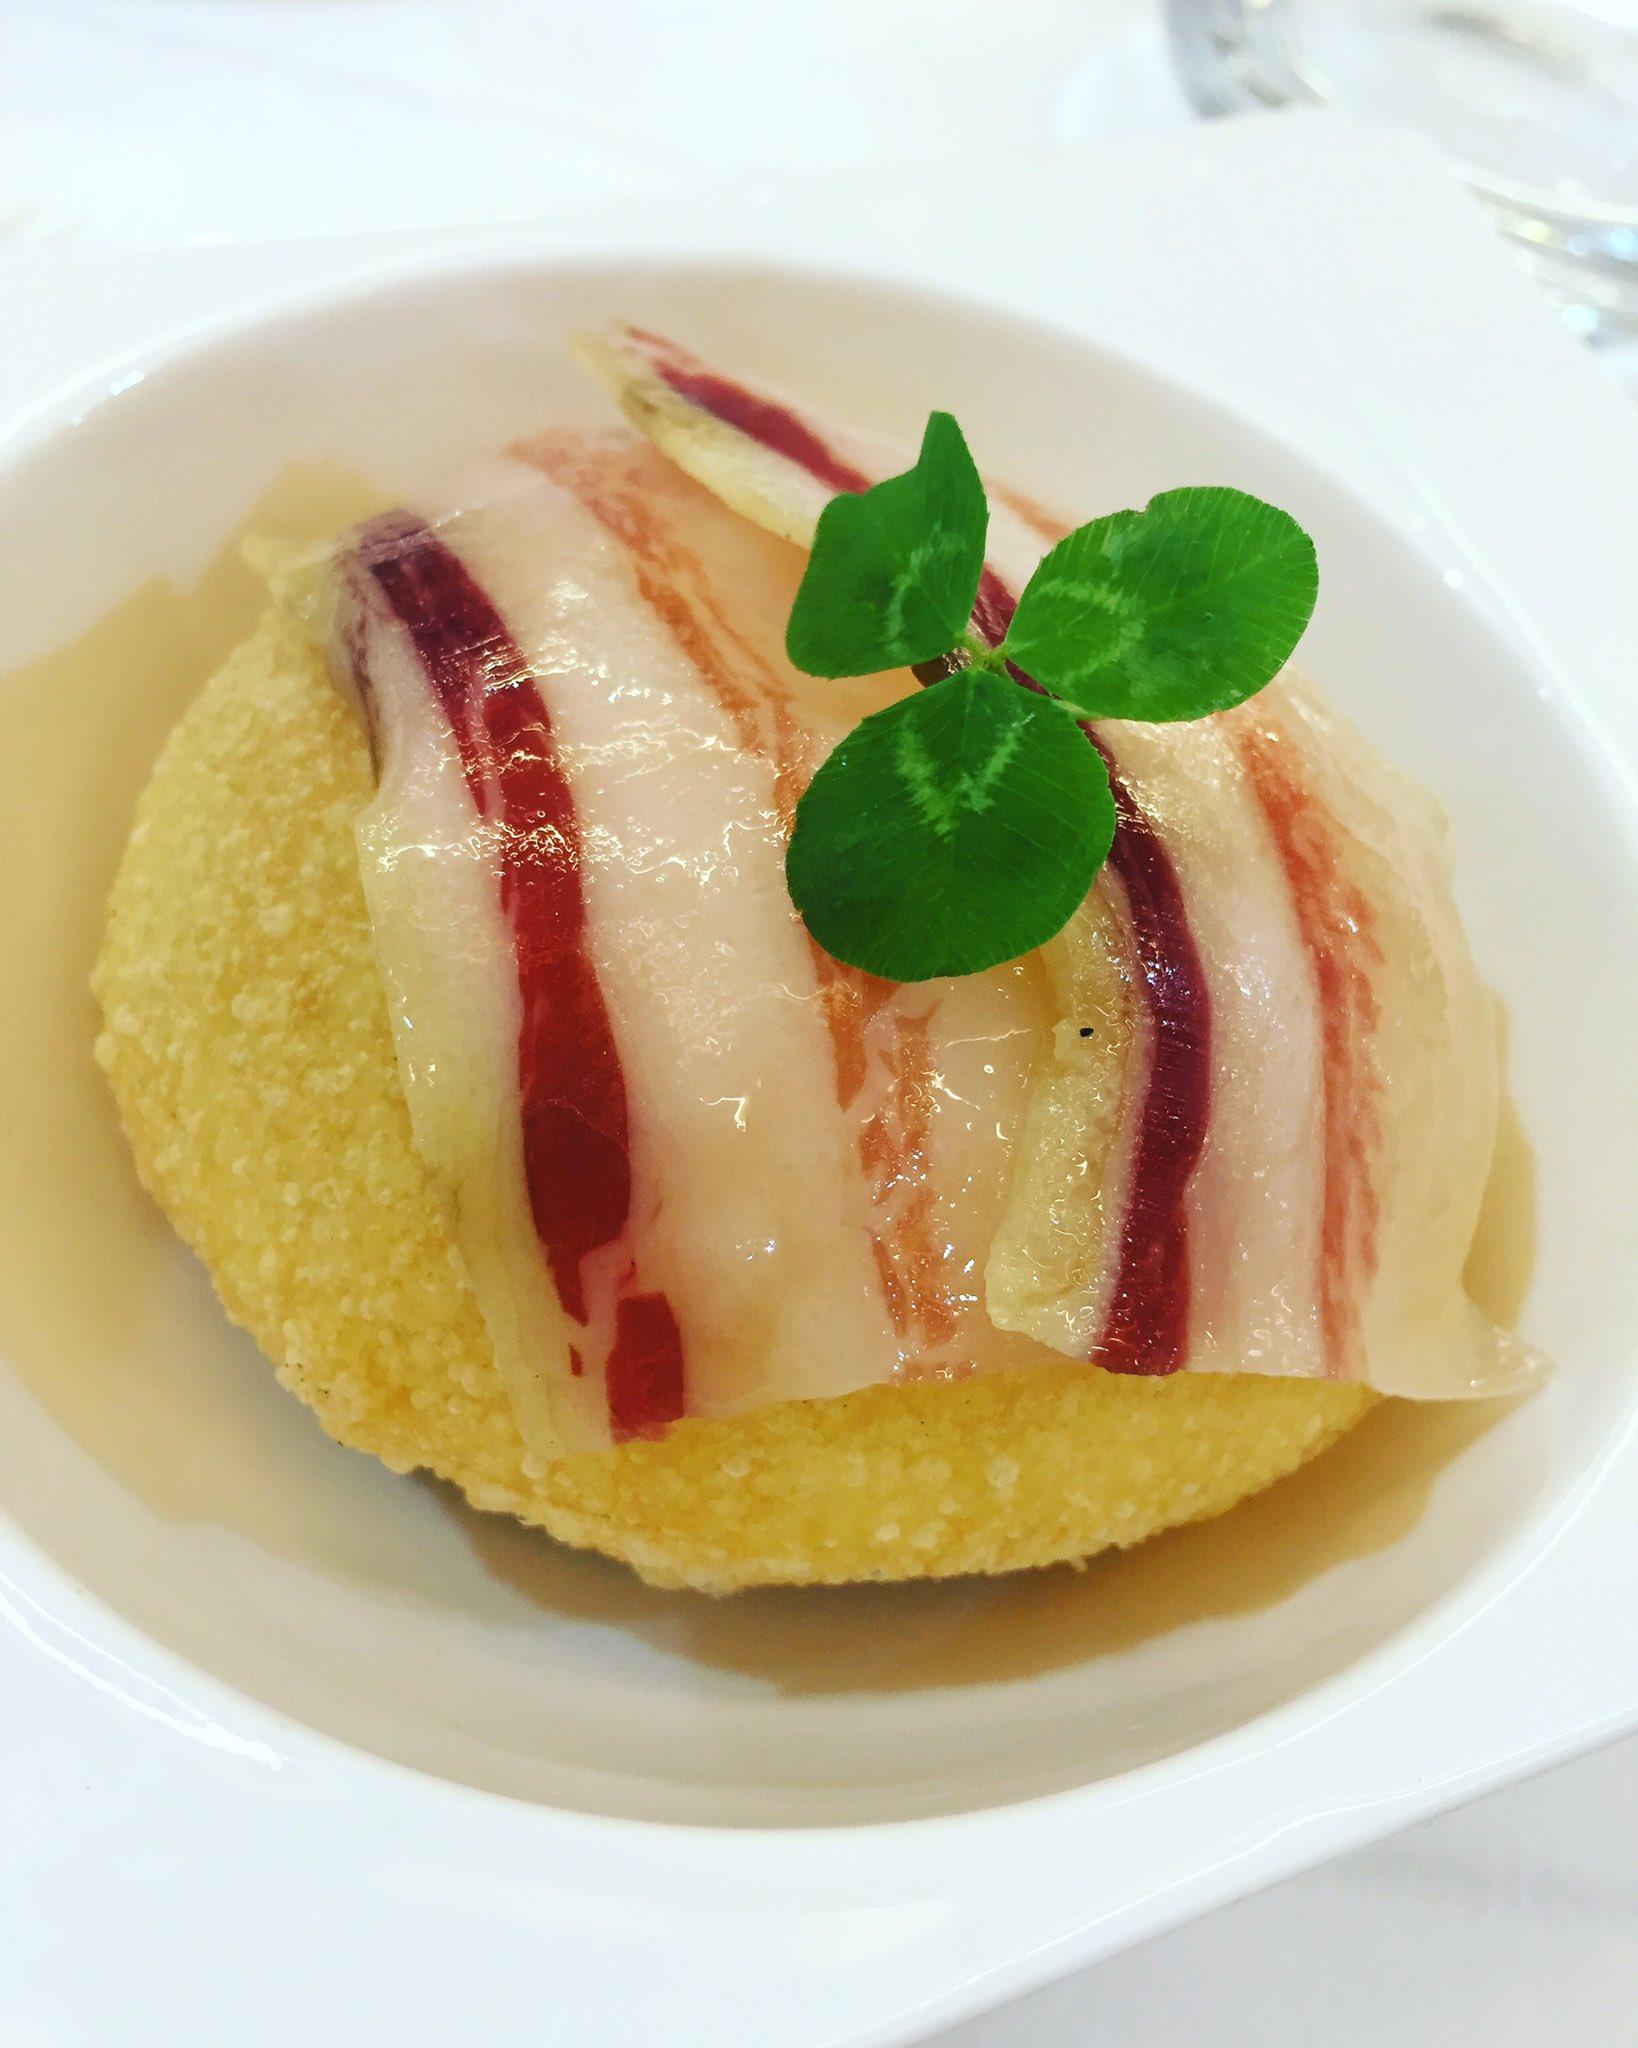 🍽Airbag de Patata y Panceta ibérica #gastronomia https://t.co/3cE78dAsQx